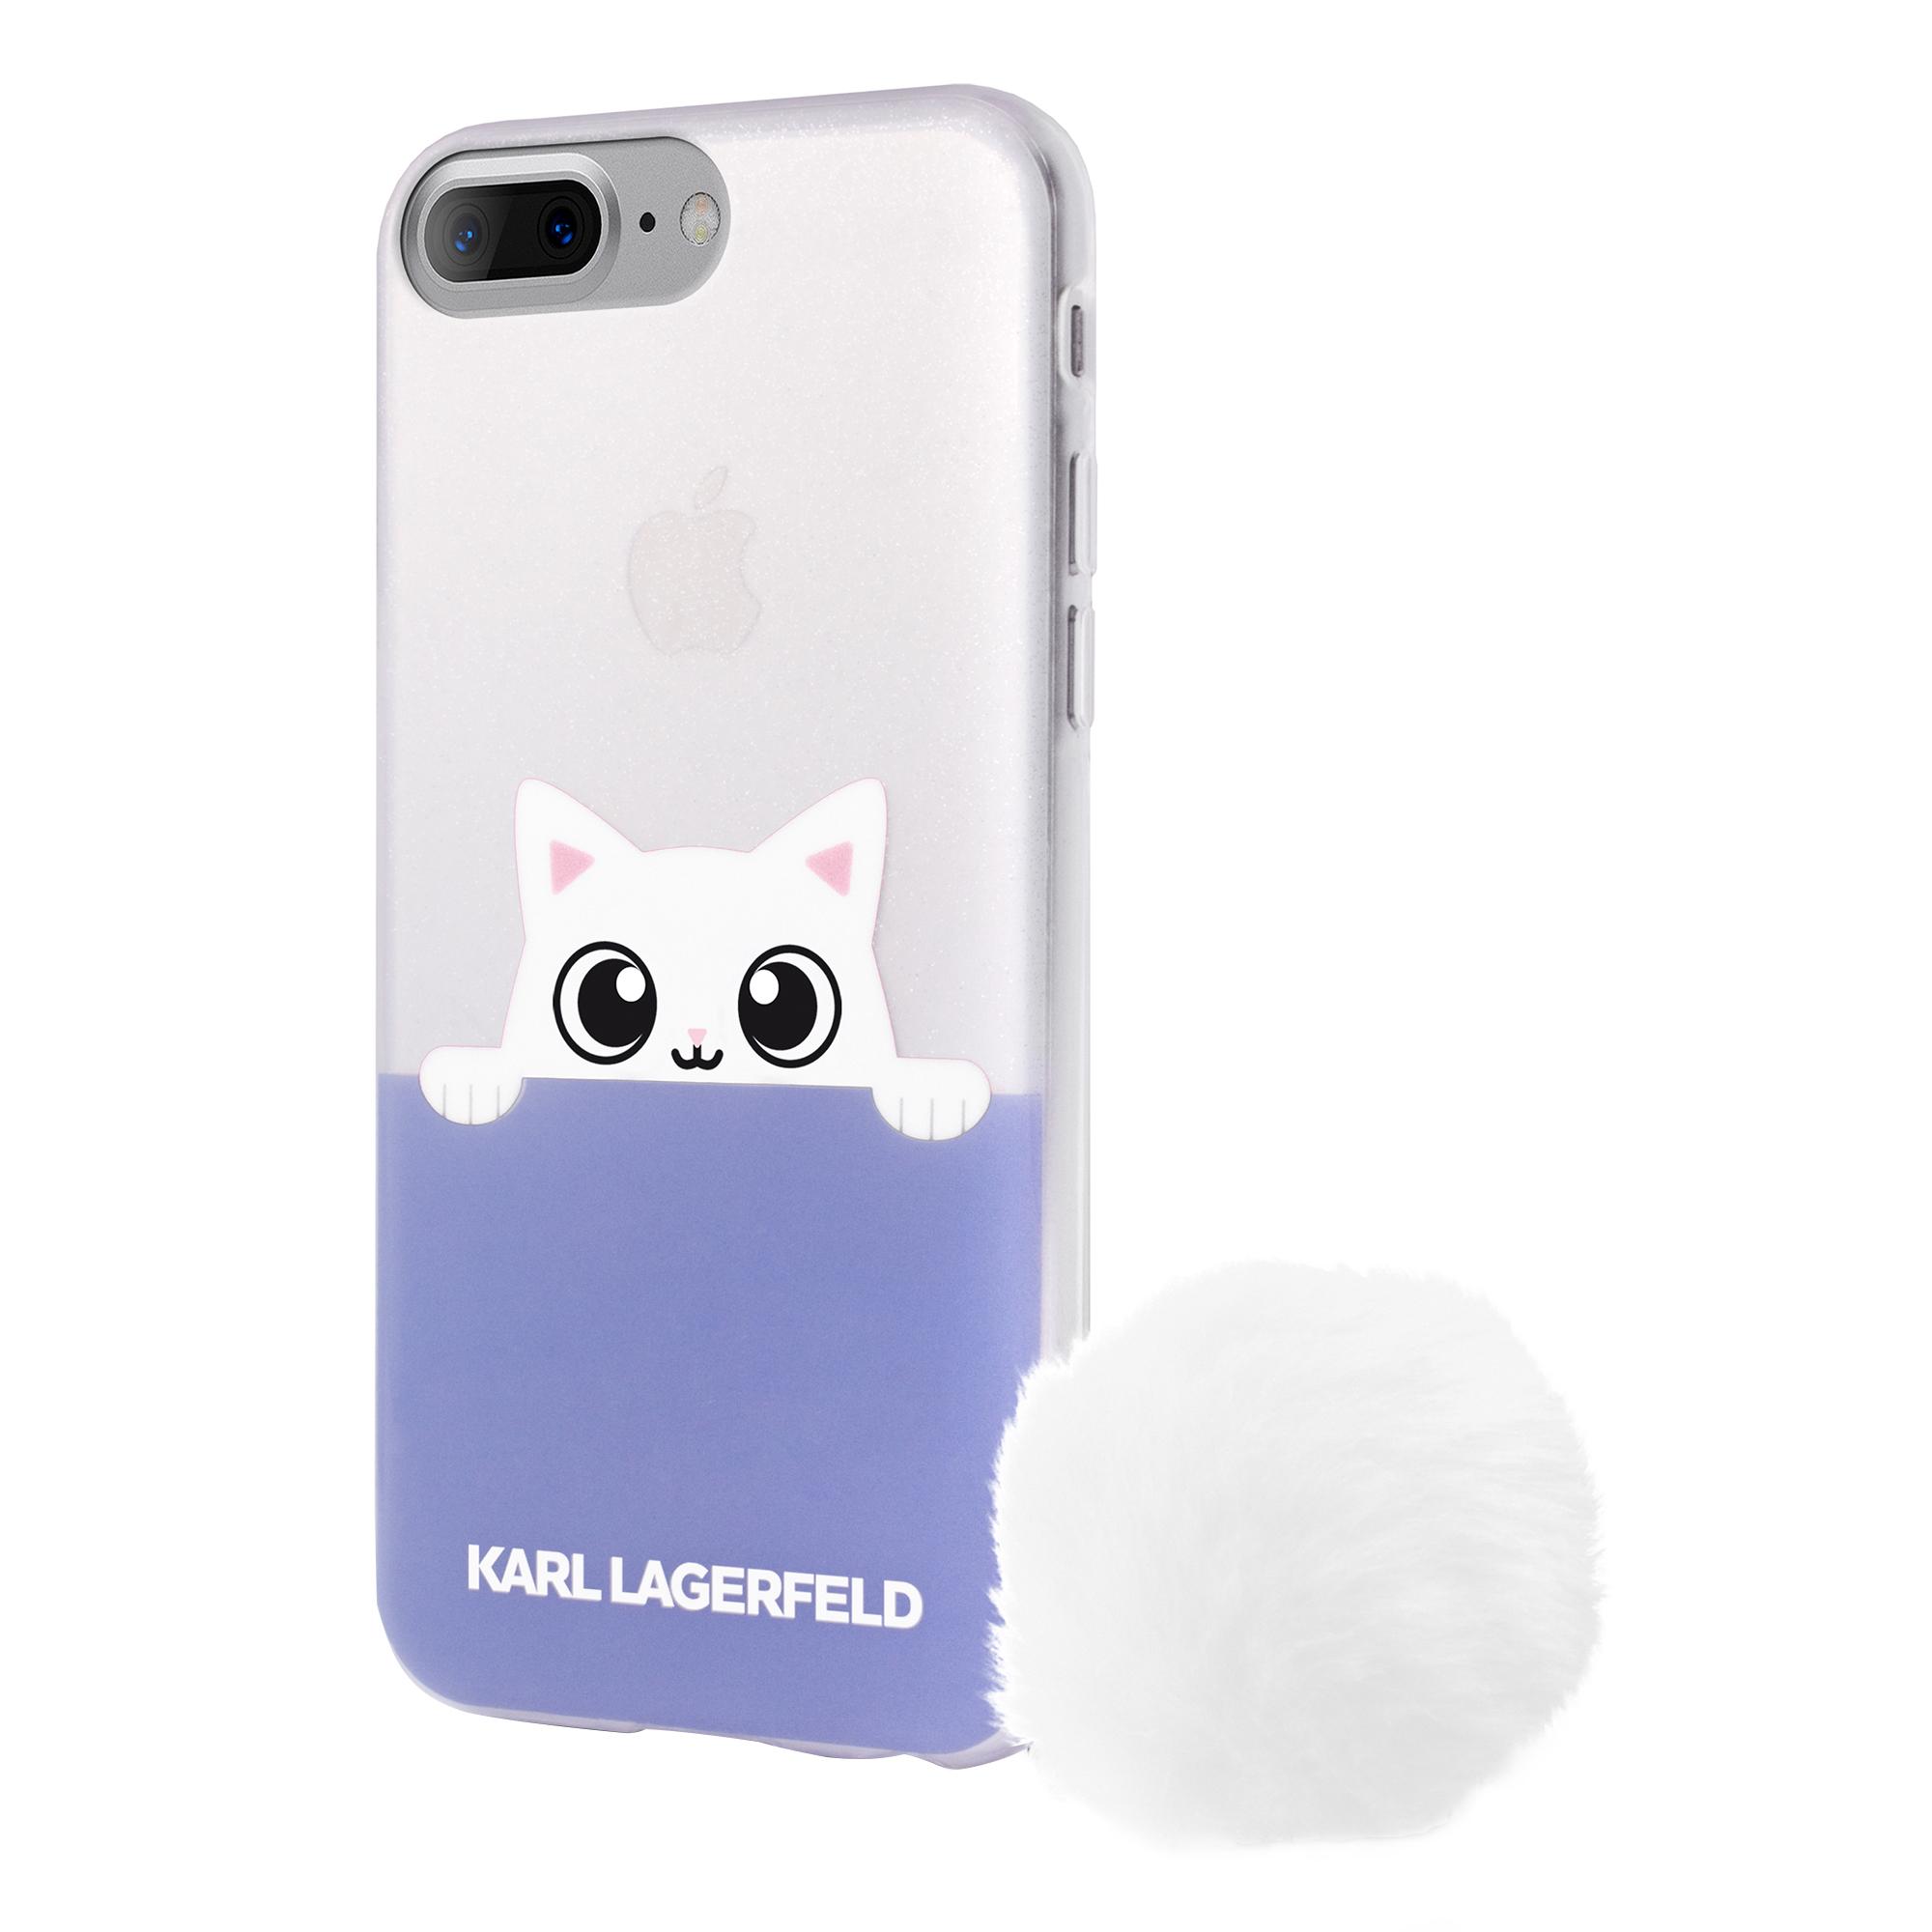 huge discount 3c5e9 ee577 KARL LAGERFELD K-Peek A Boo Case for iPhone 7 Plus - SmarTone Online ...